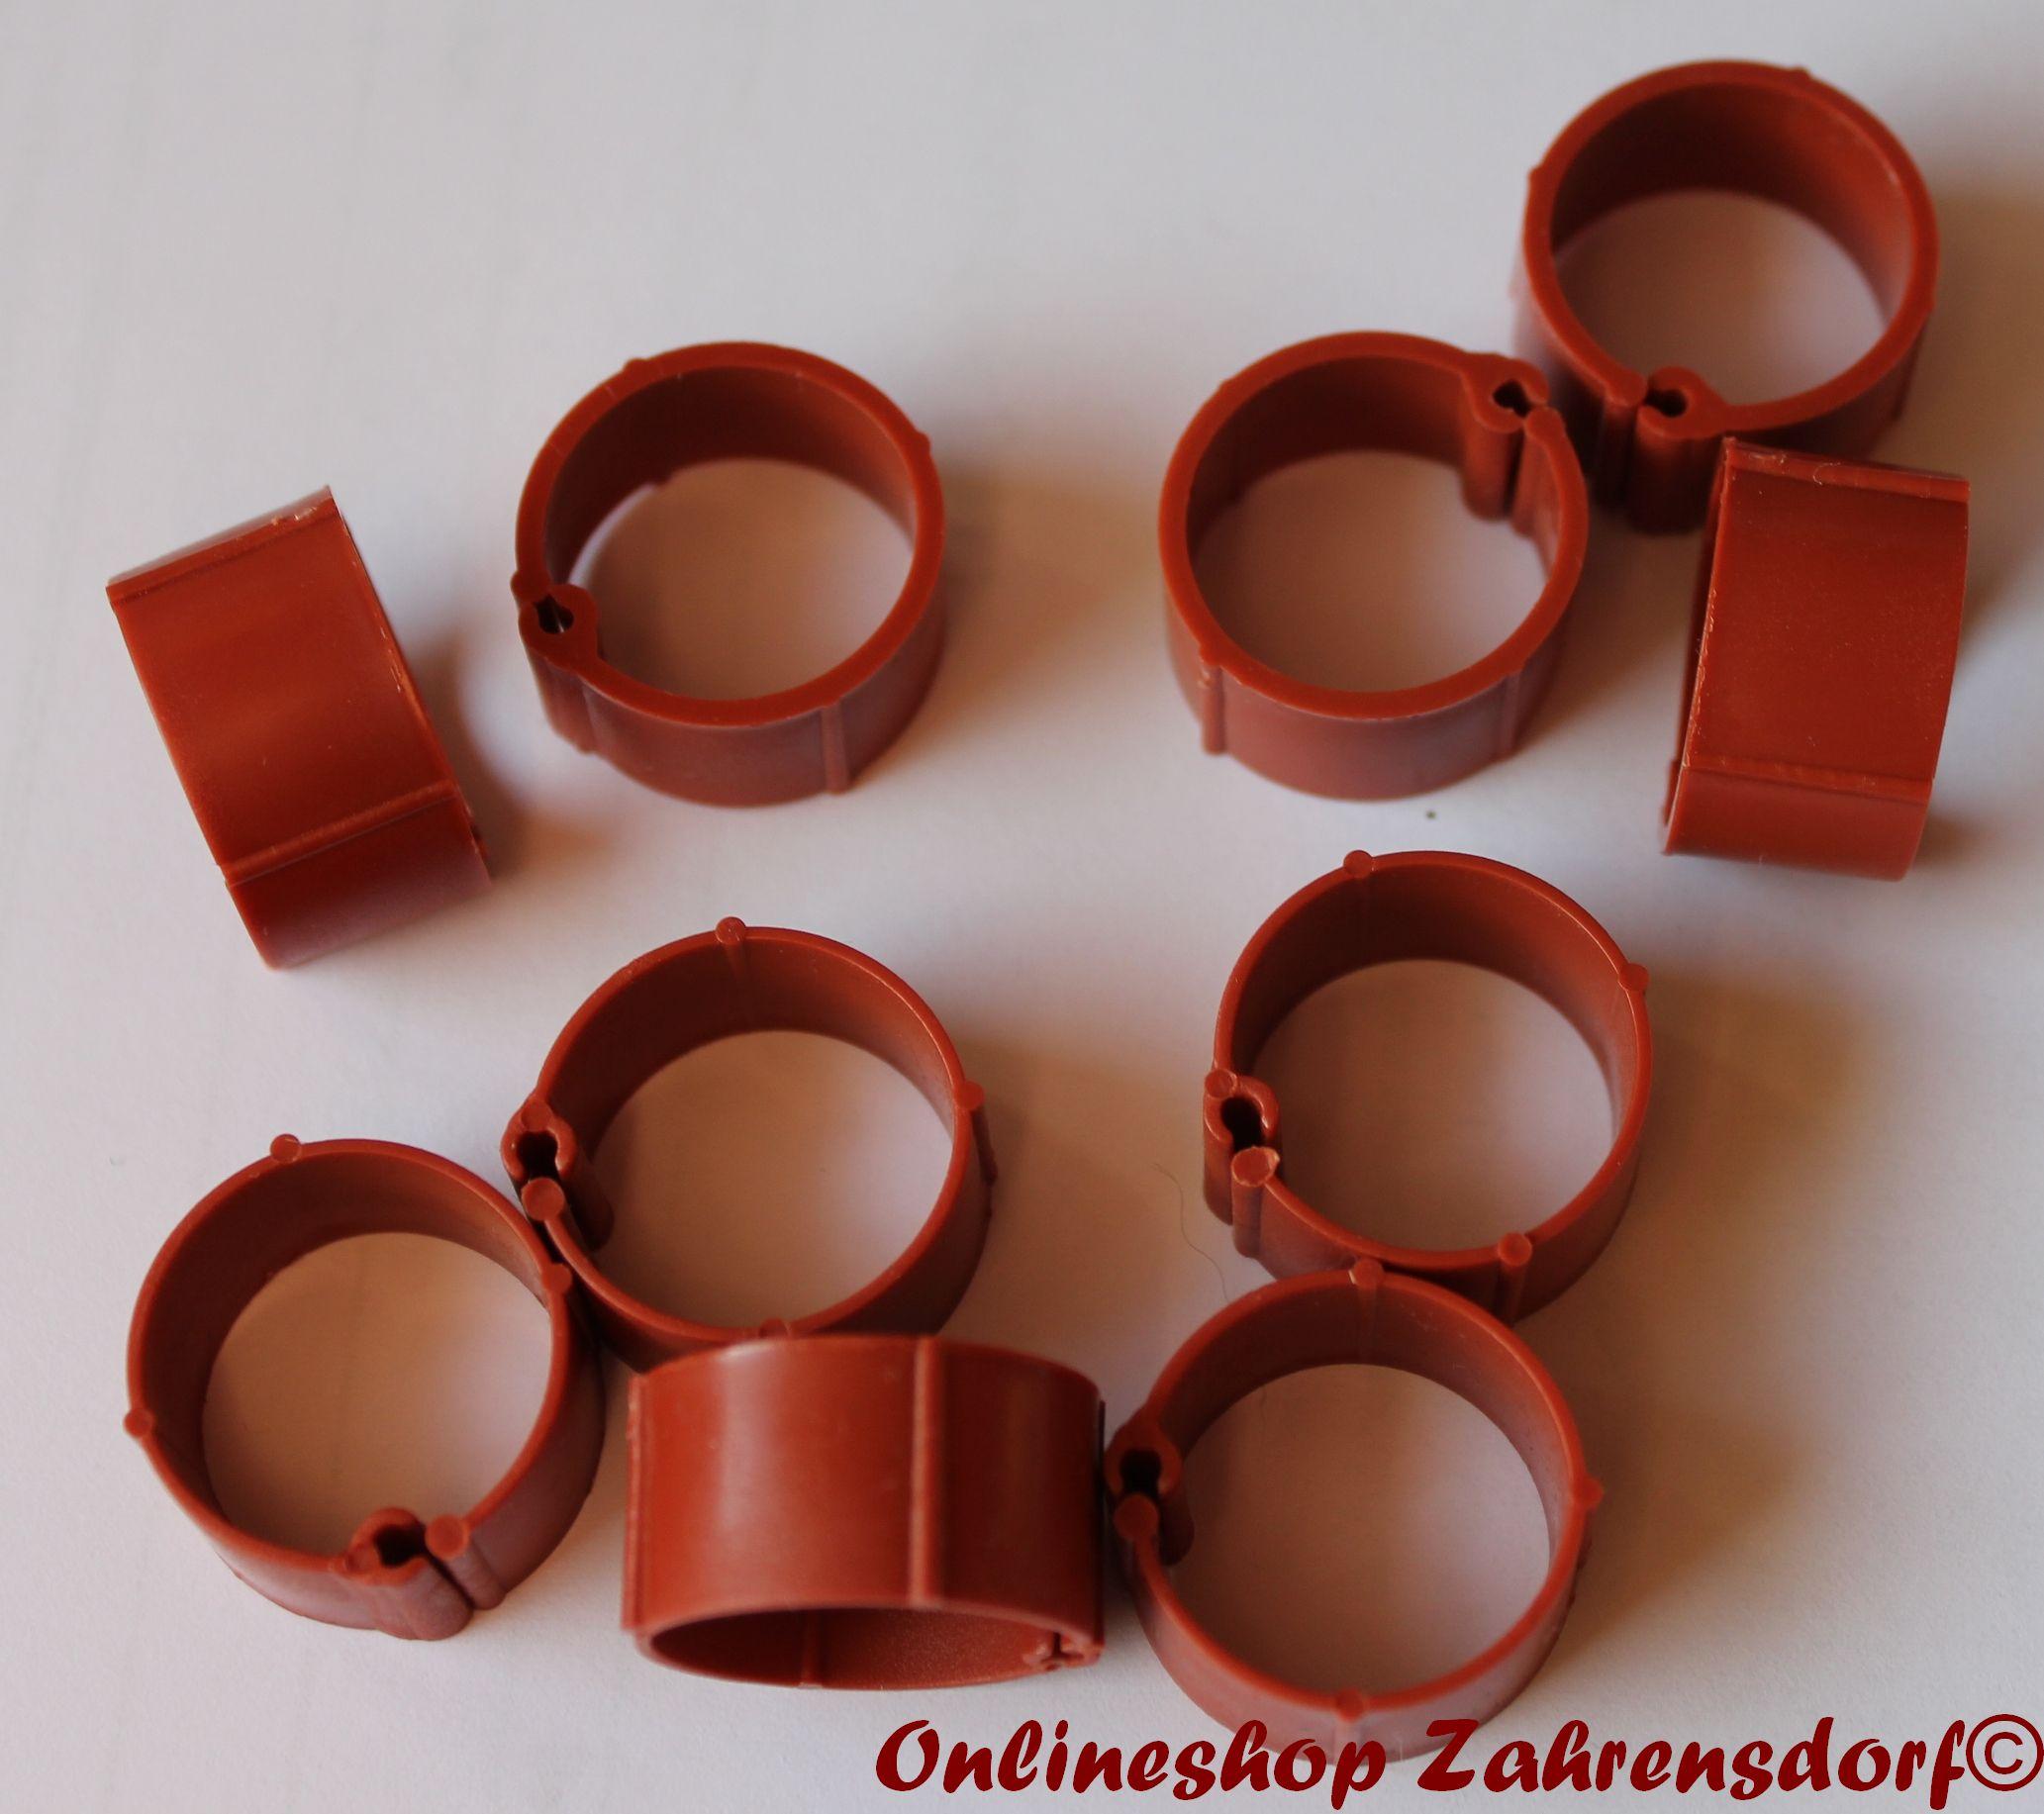 Clipsringe braun 07 mm 10 Stück